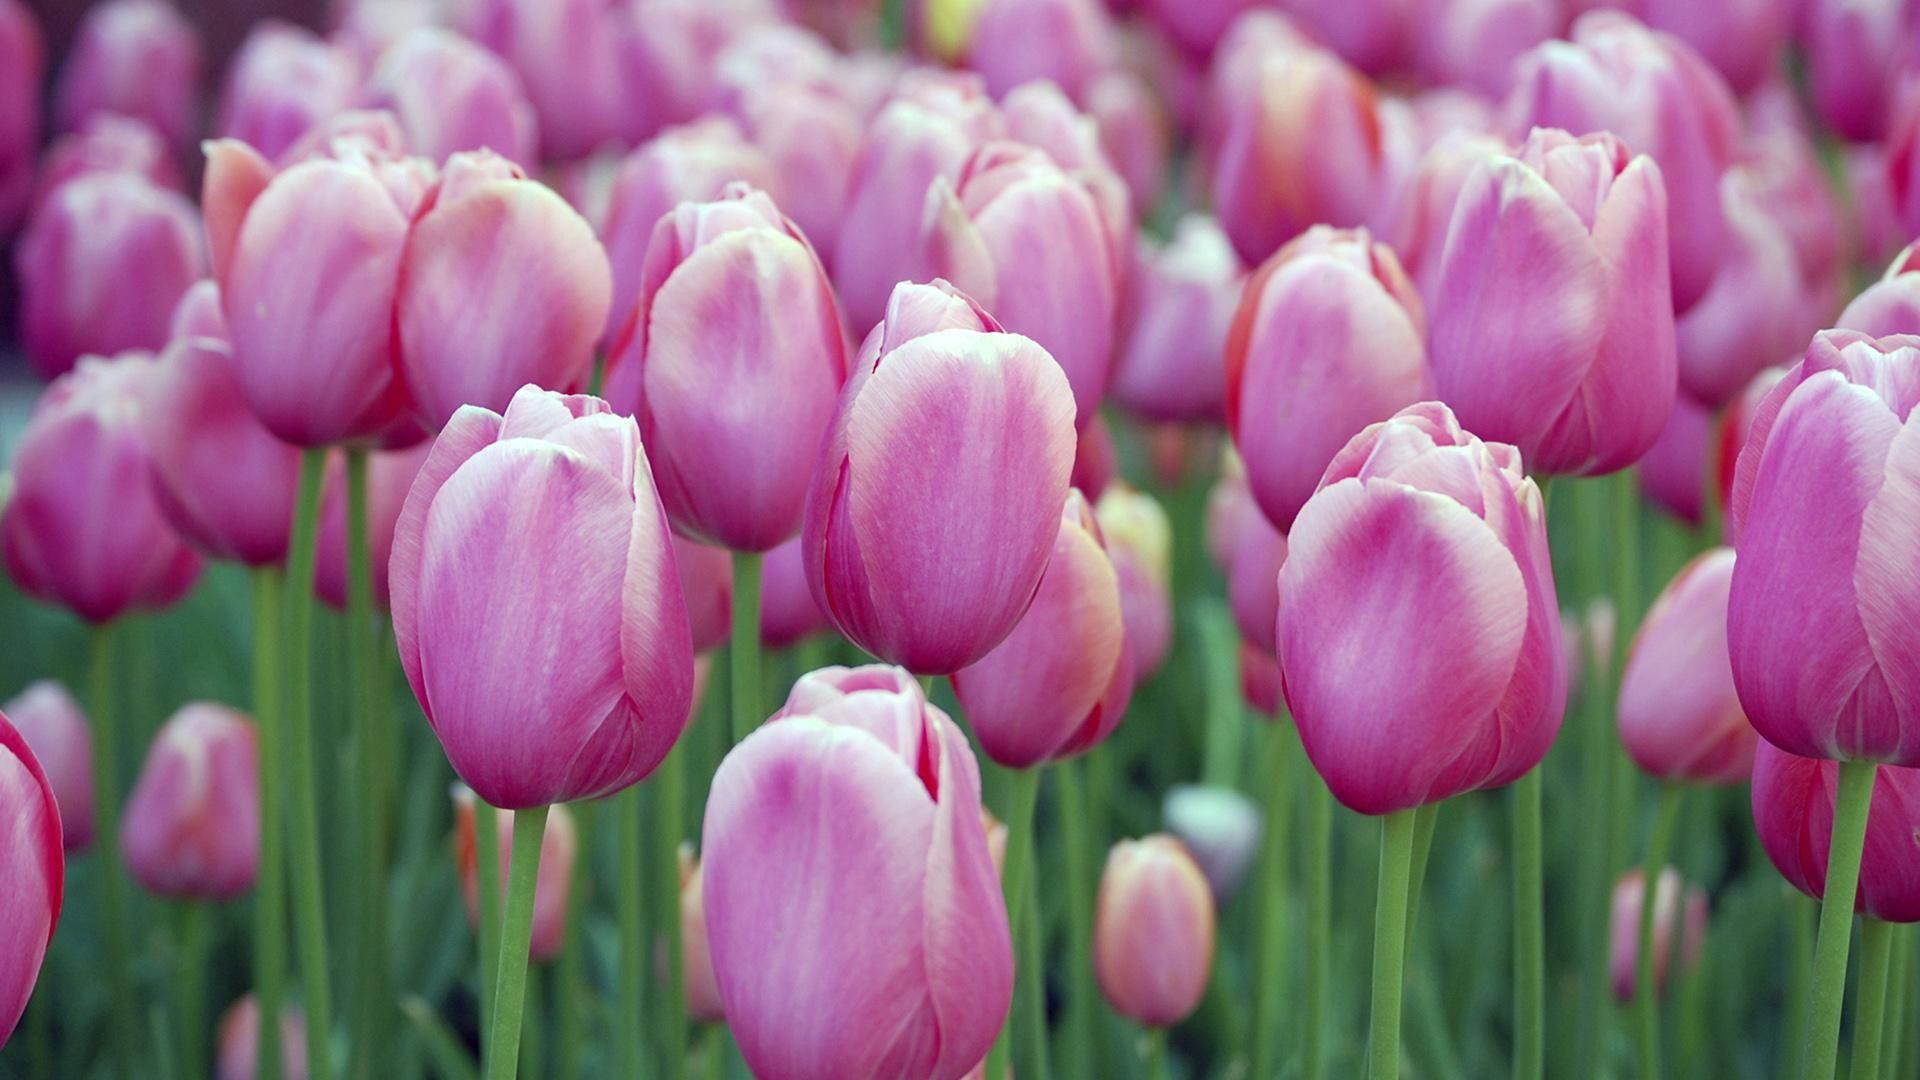 Beautiful Nature Spring Flower Wallpaper Hd 14 Spring Flowers Wallpaper Flower Seeds Tulip Seeds